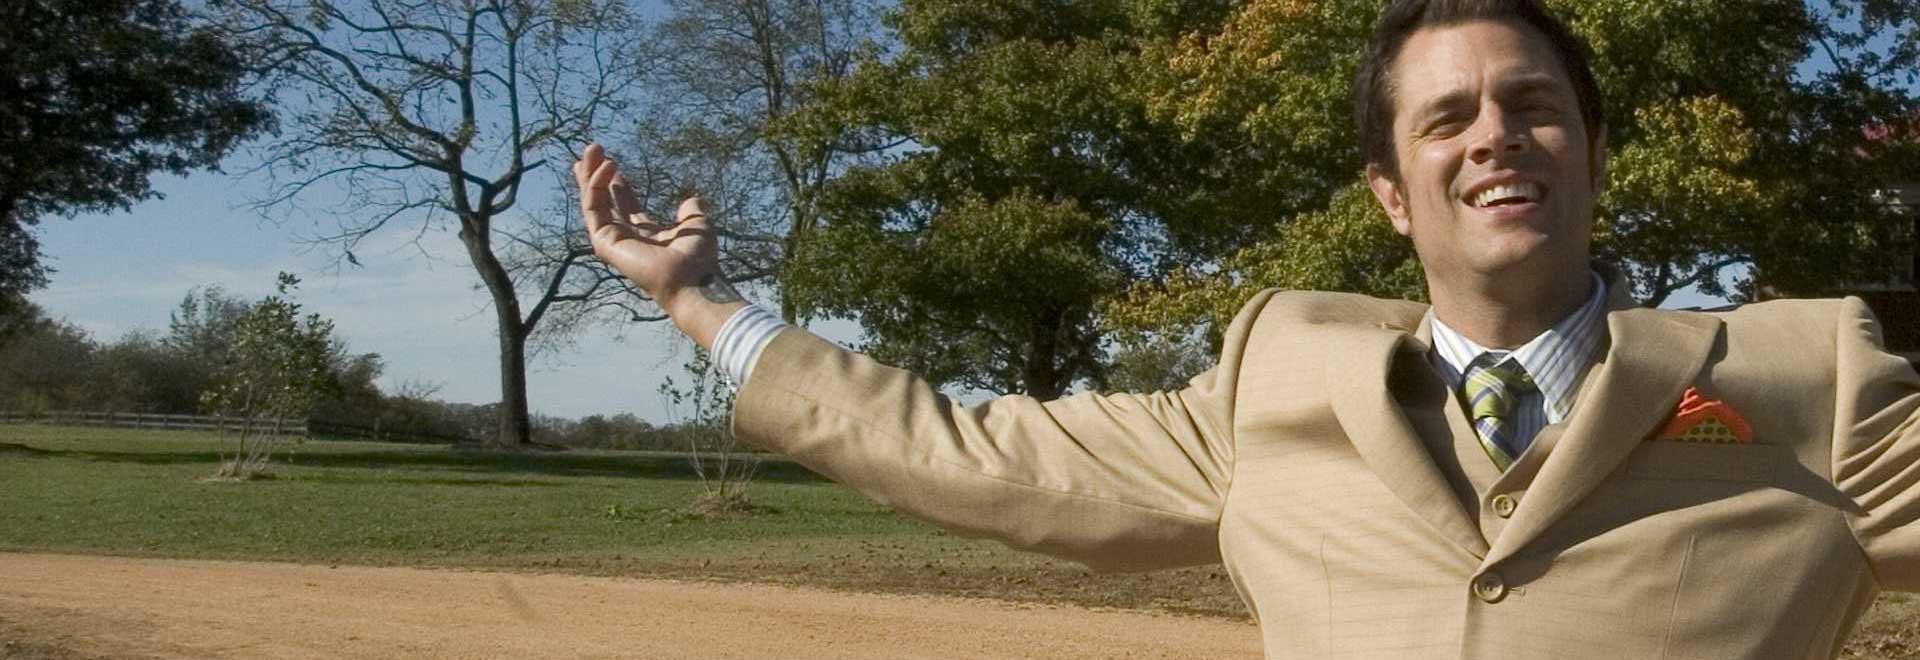 Daltry Calhoun - Un golfista al verde